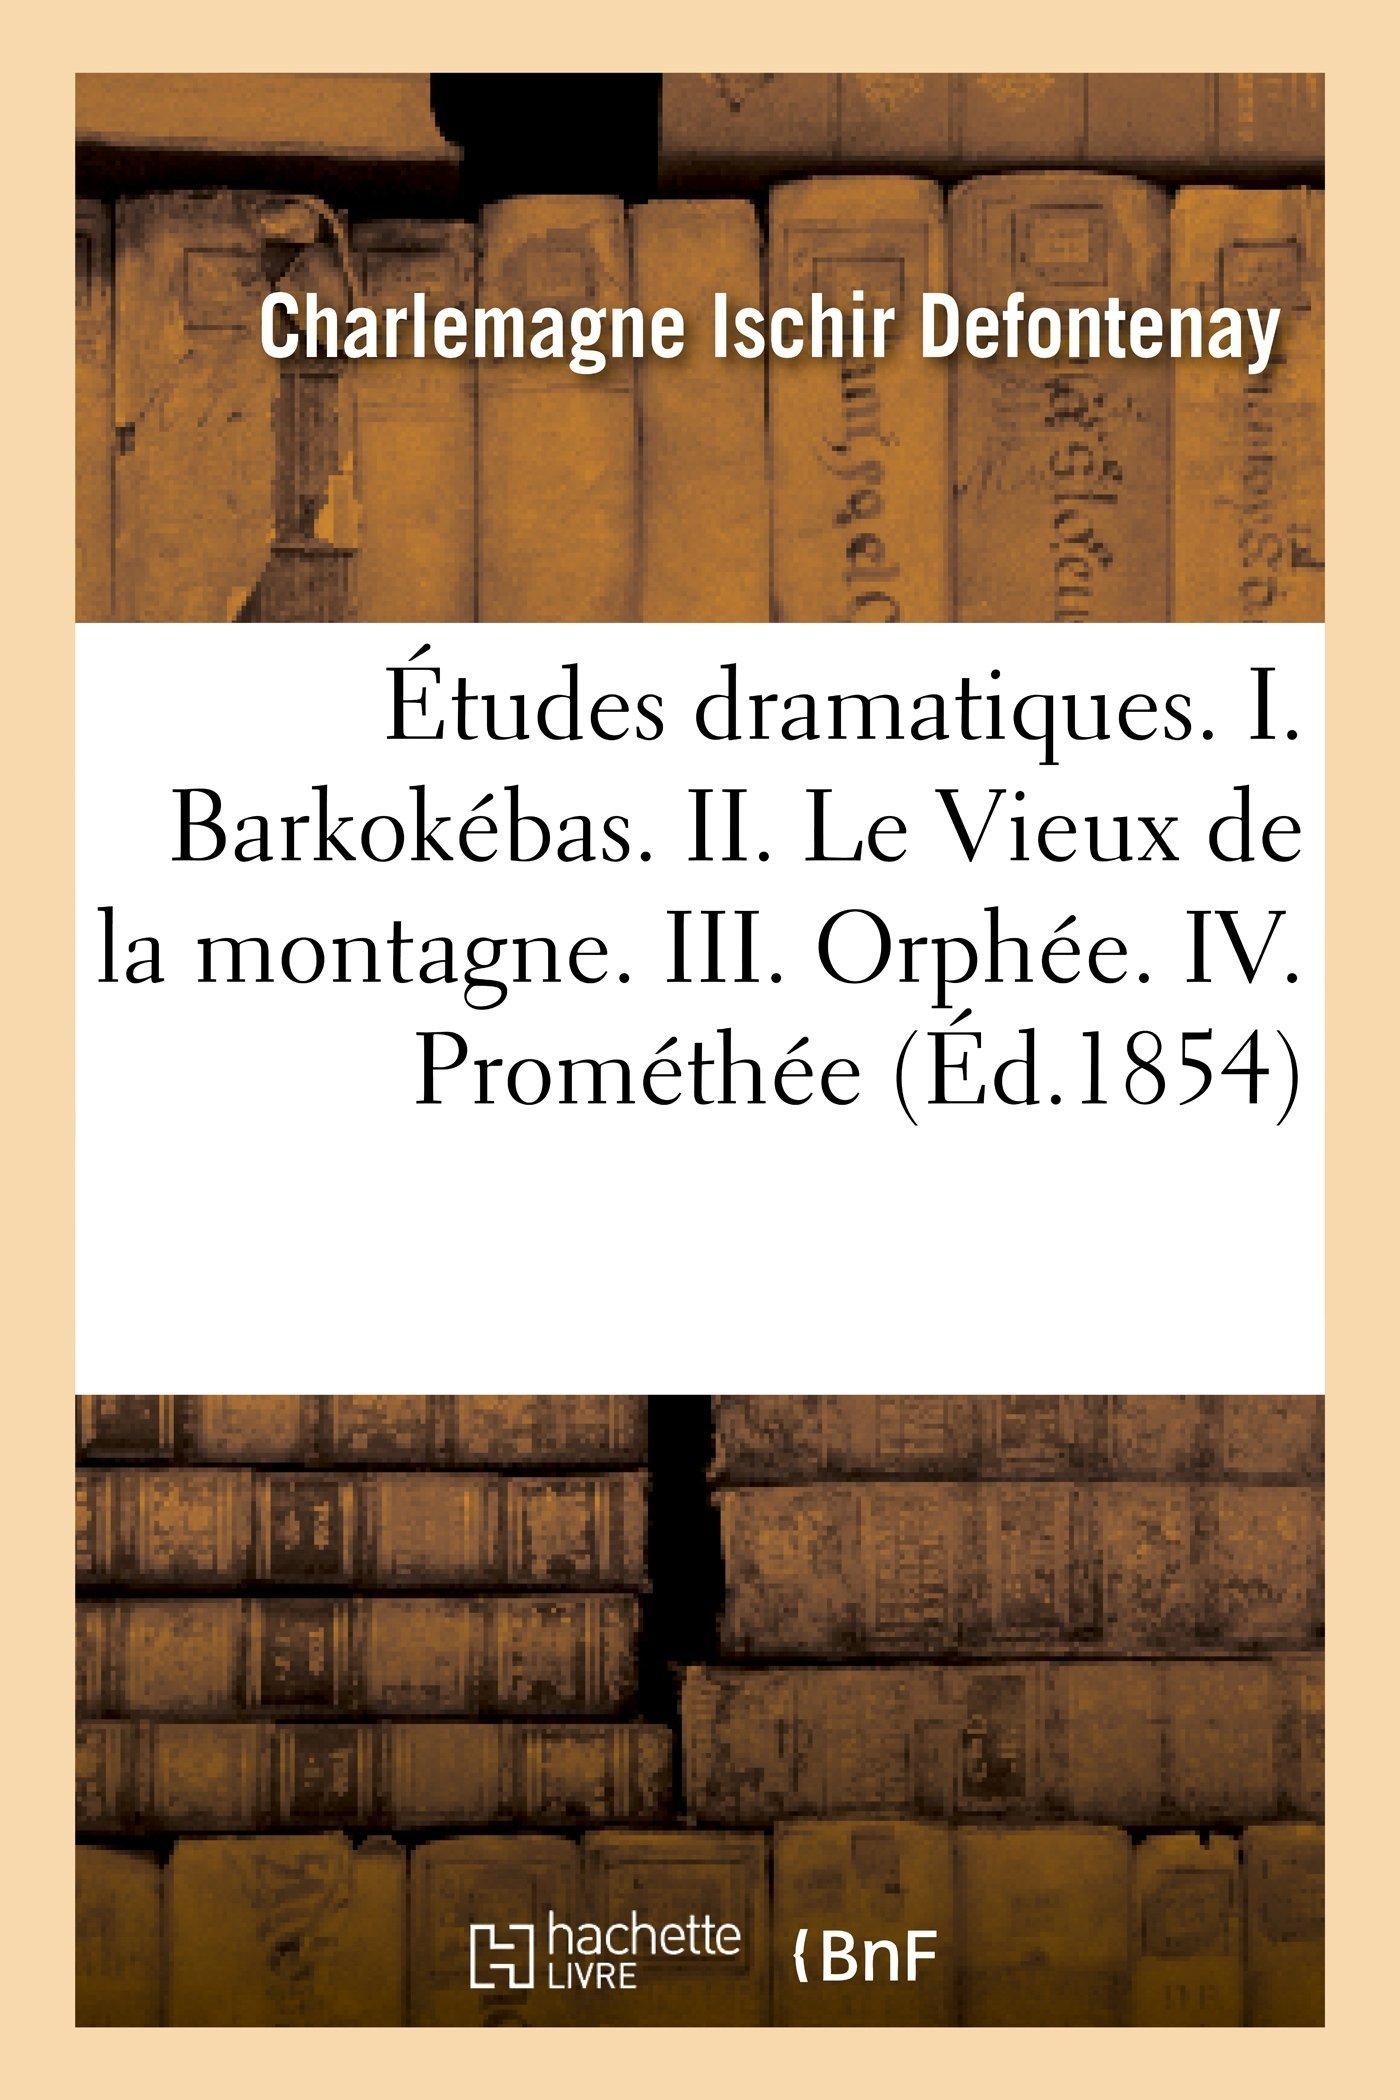 Etudes Dramatiques. I. Barkokebas. II. Le Vieux de La Montagne. III. Orphee. IV. Promethee Charlemagne Ischir Defontenay